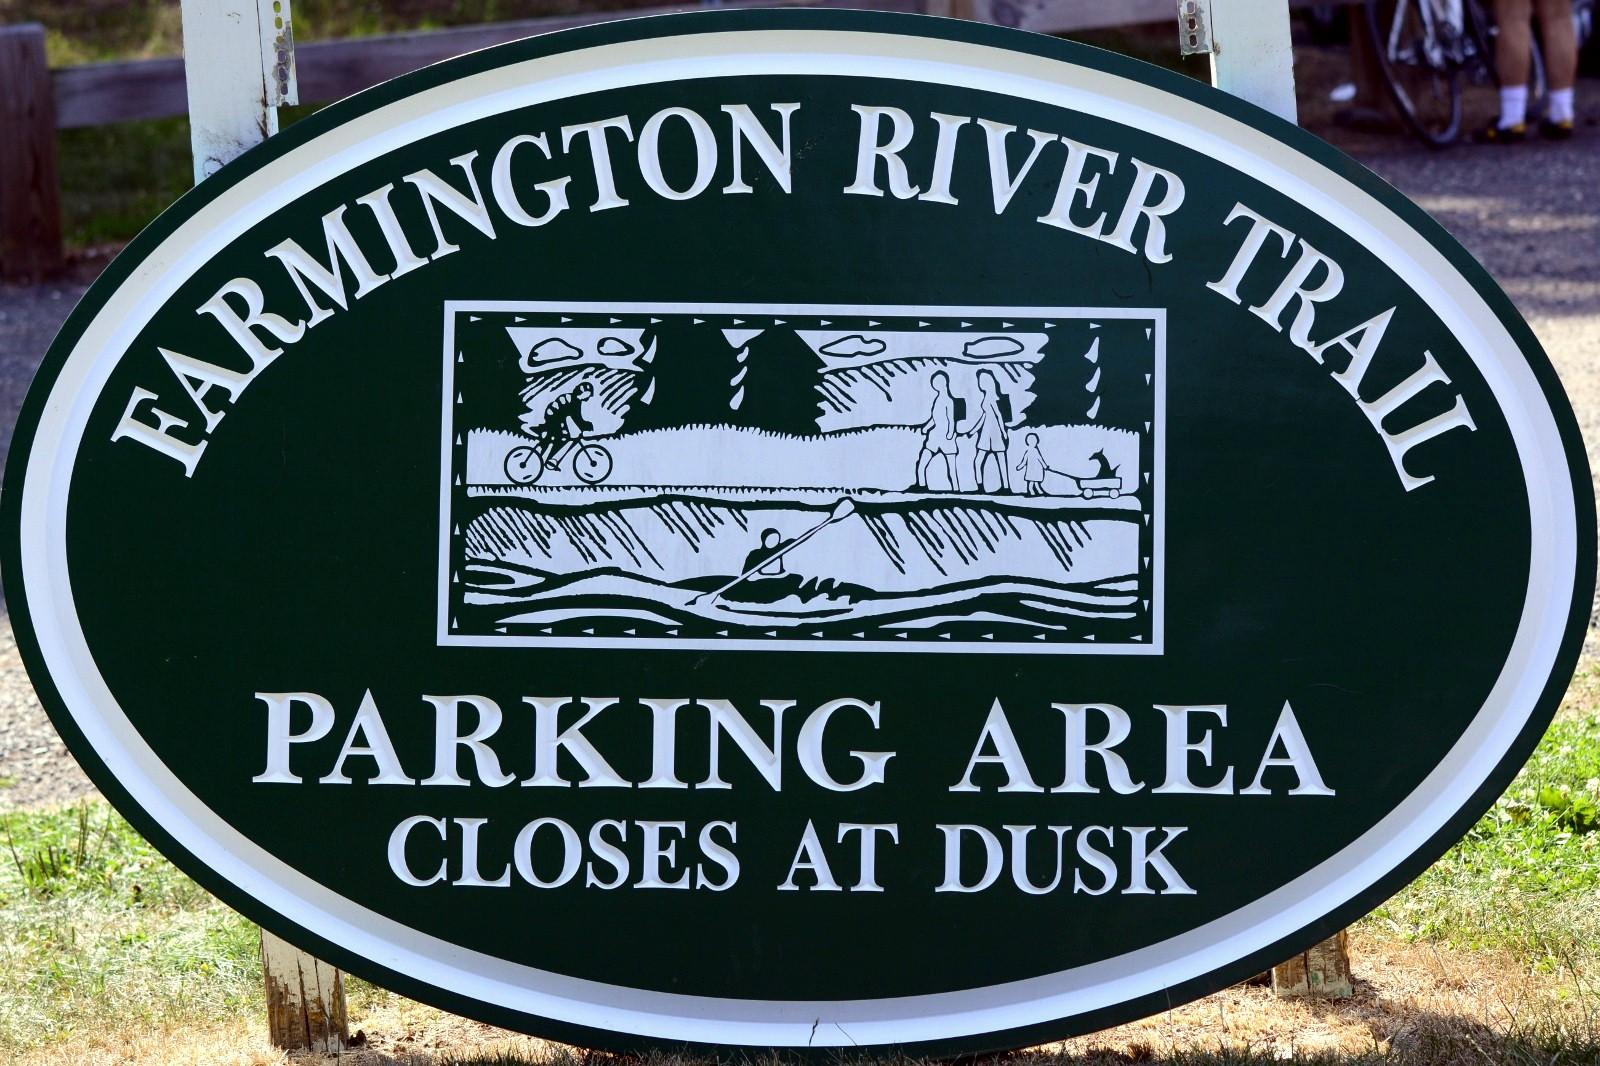 Farmington River Trail (1)